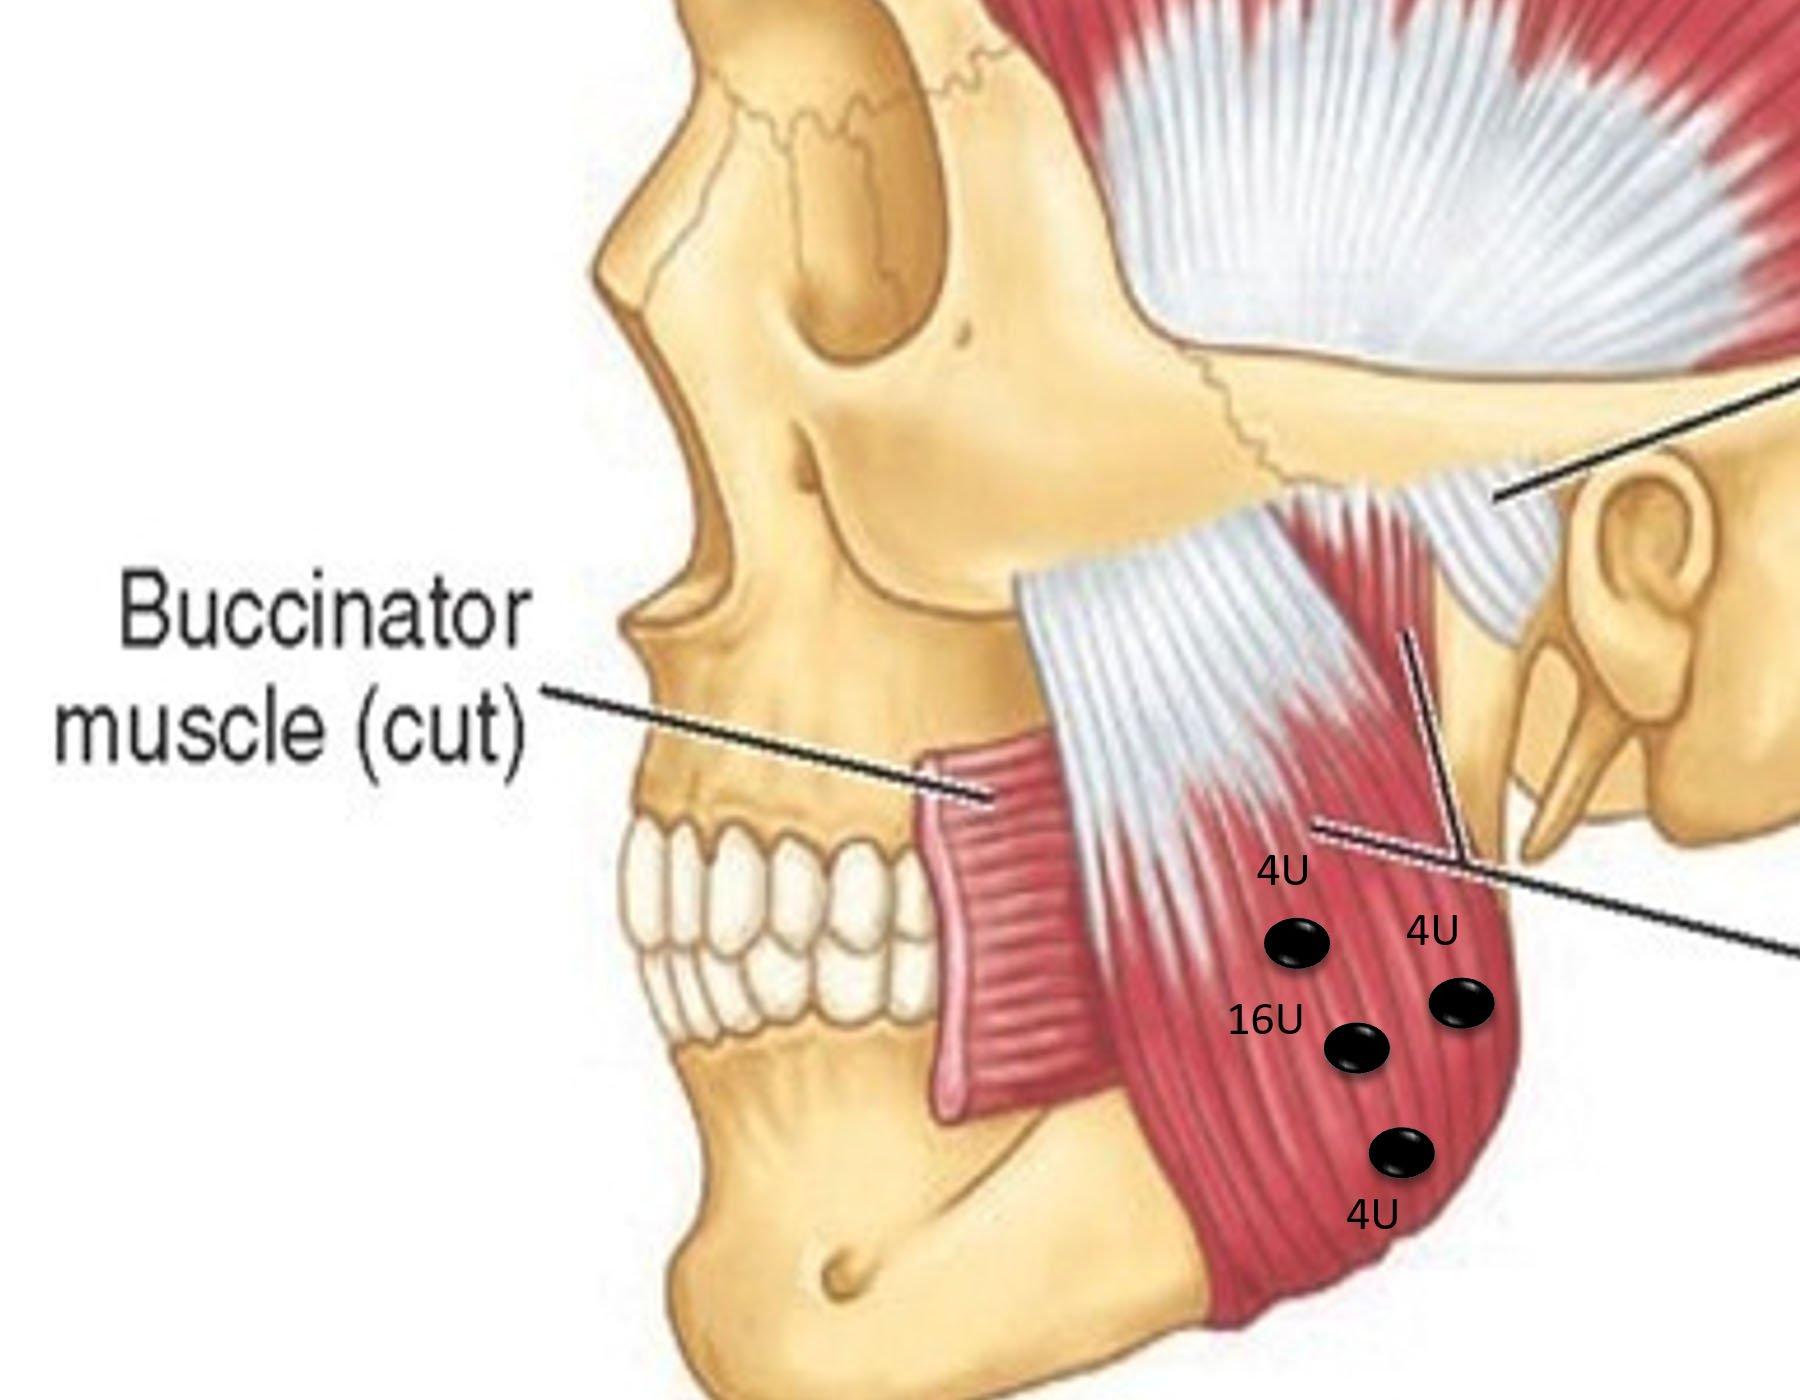 buccinator muscle cut